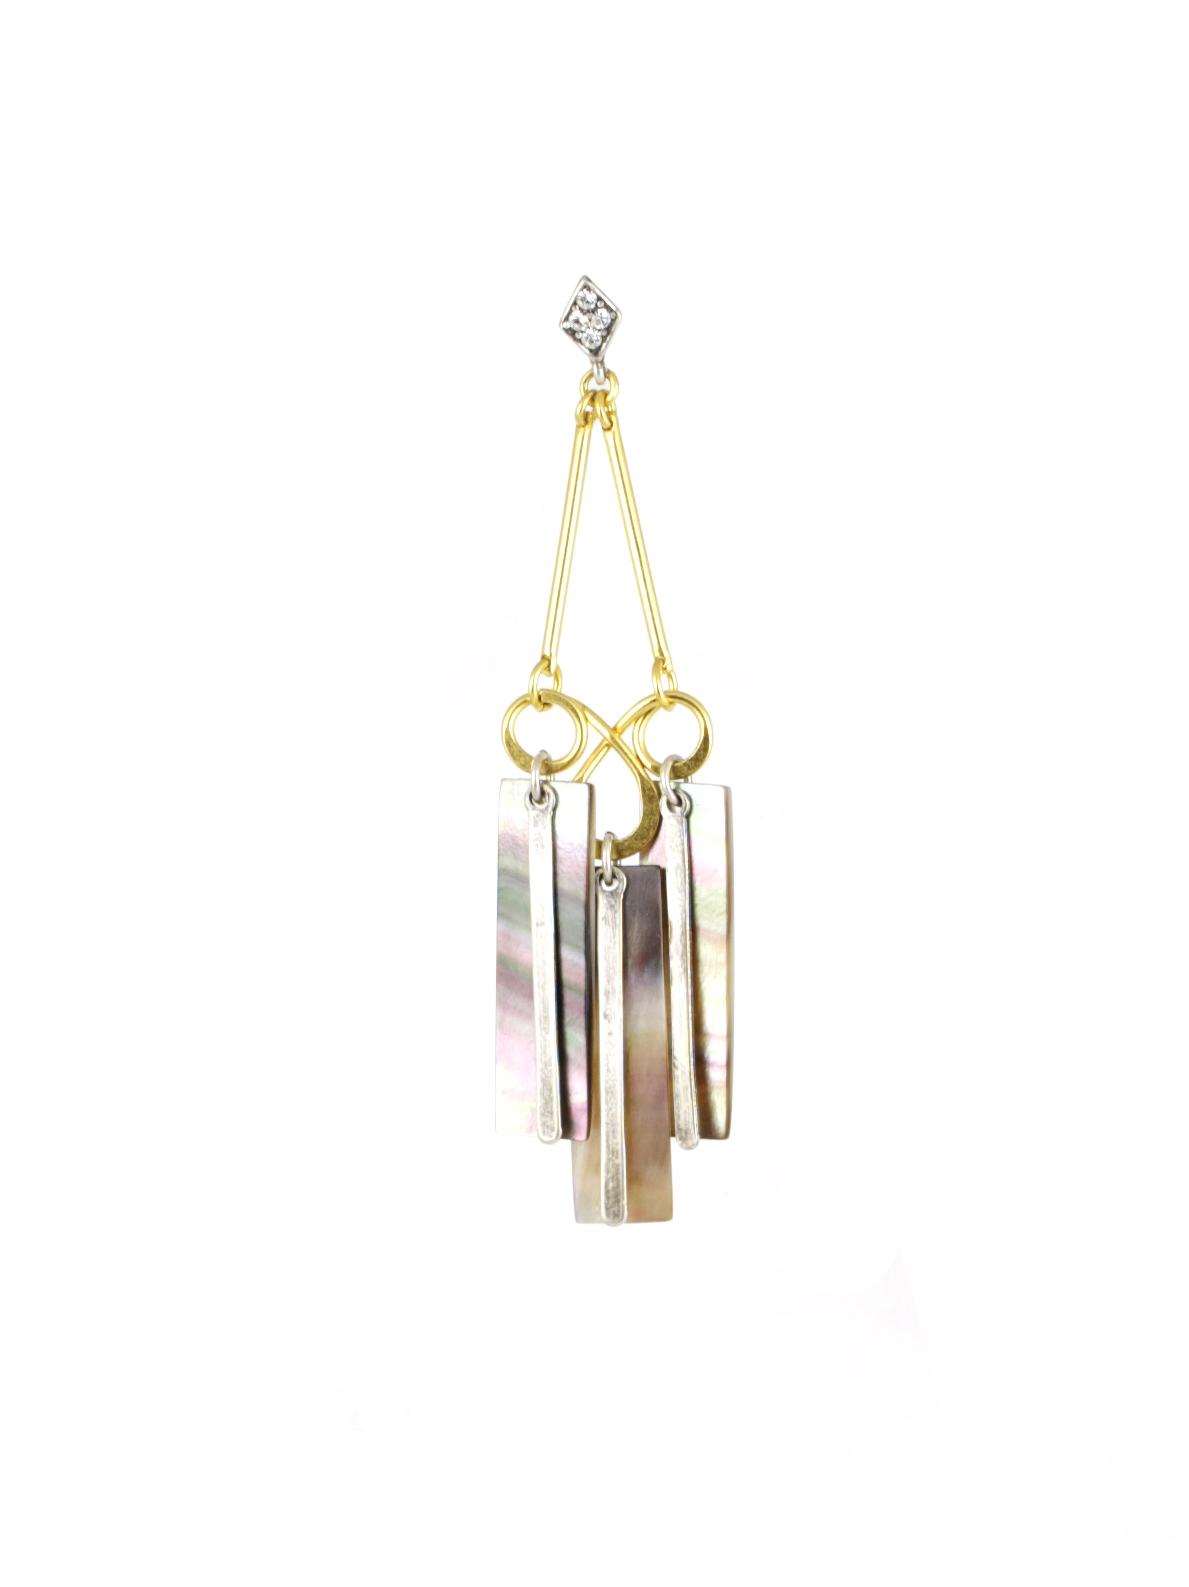 Rainbow Shower chandelier earring,  available at Gerard Yosca .